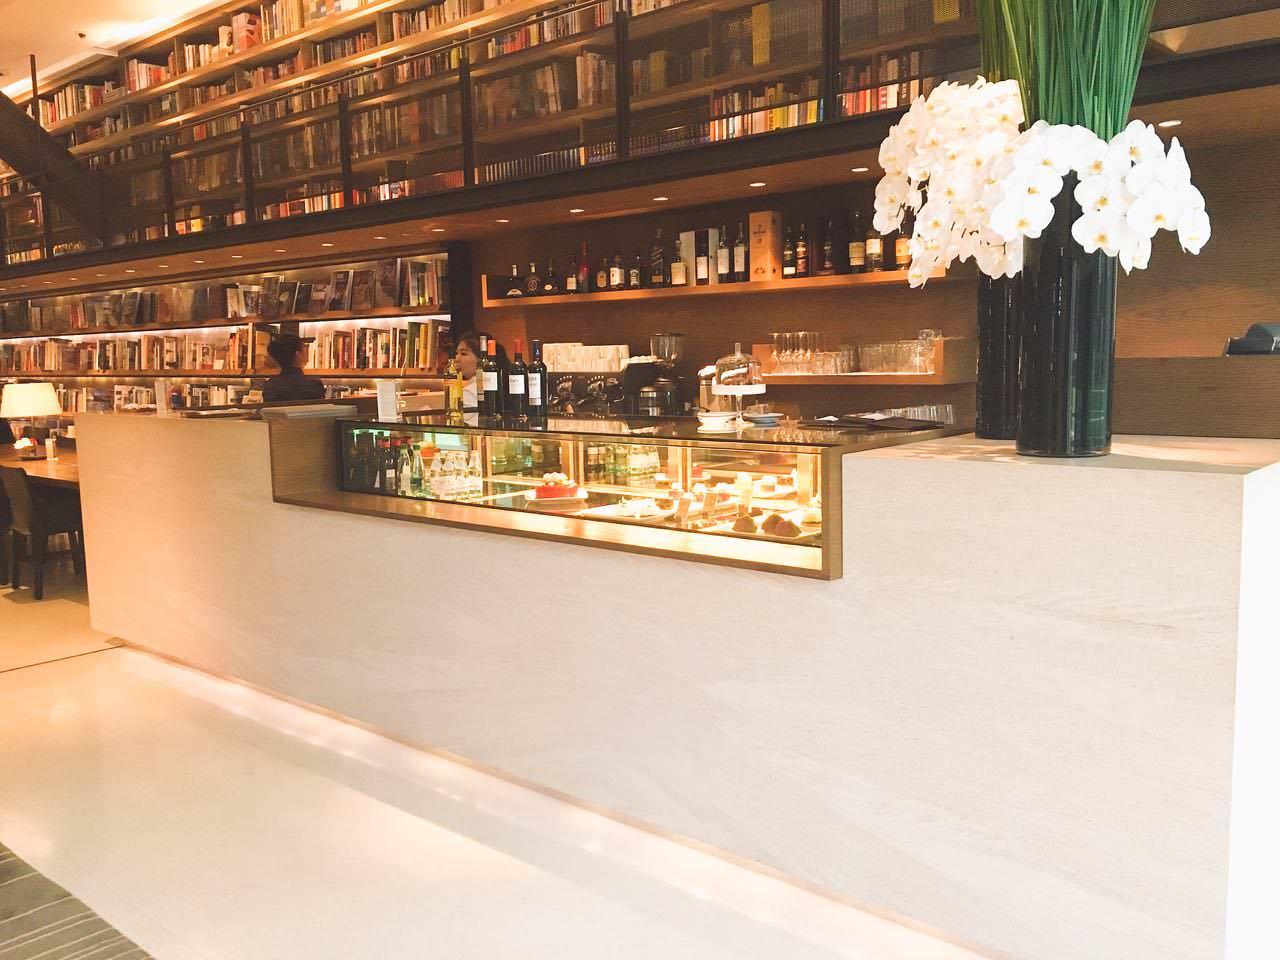 松菸誠品行旅咖啡店》The Lounge 大廳書房   Eslite Hotel Coffee